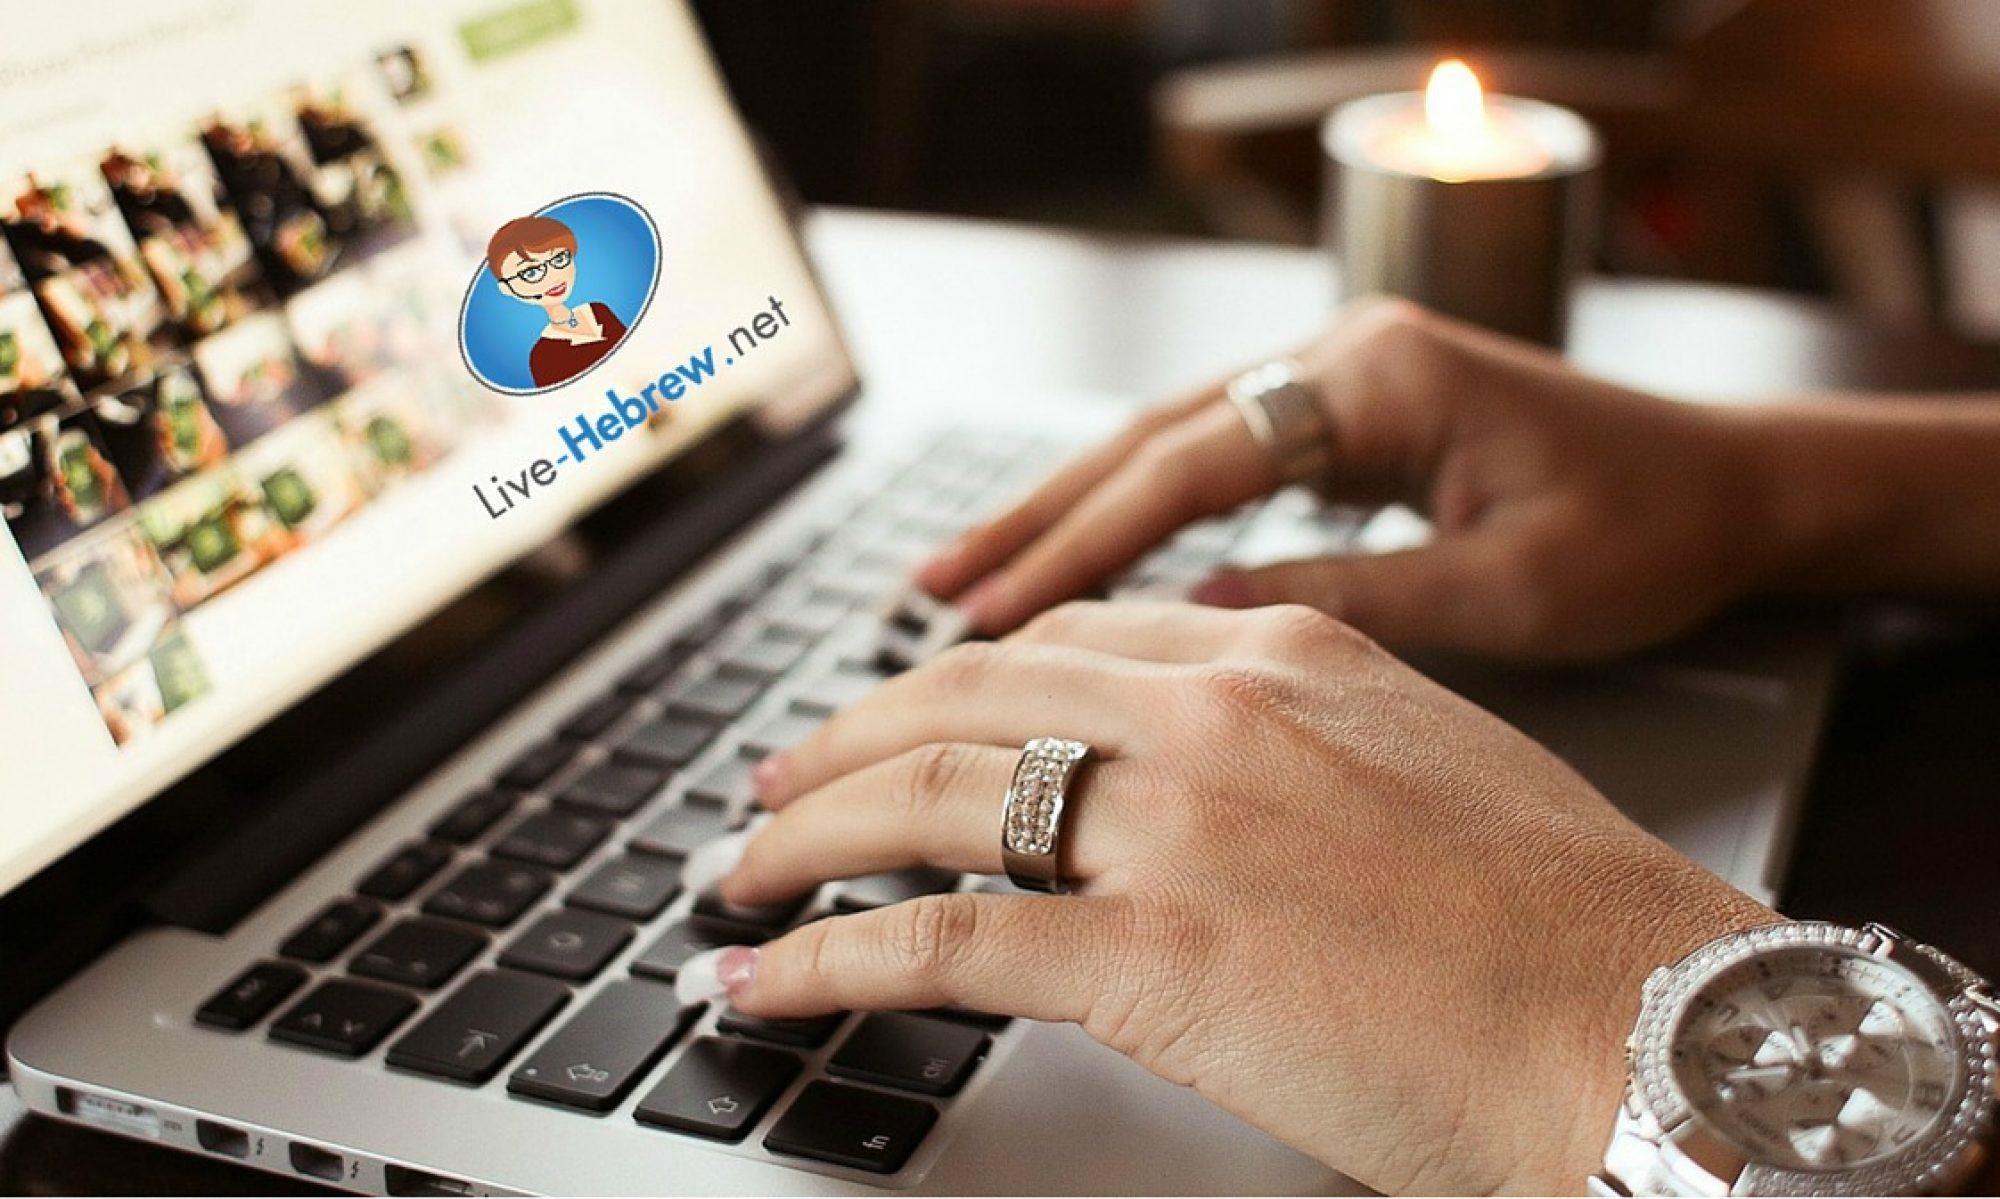 Apprendre l'hébreu en ligne